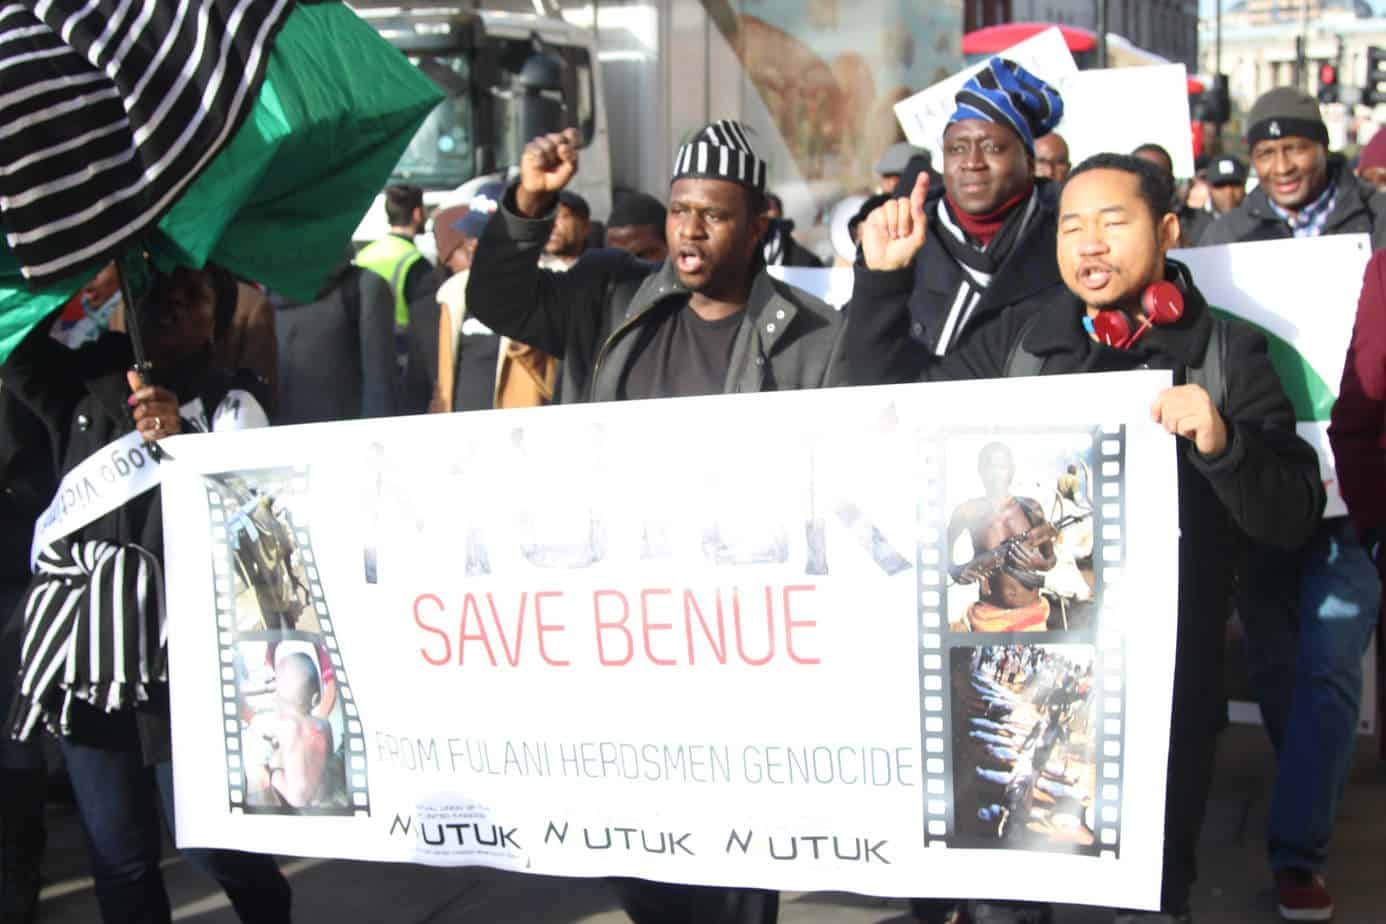 CAN calls for nationwide protest against herdsmen killings